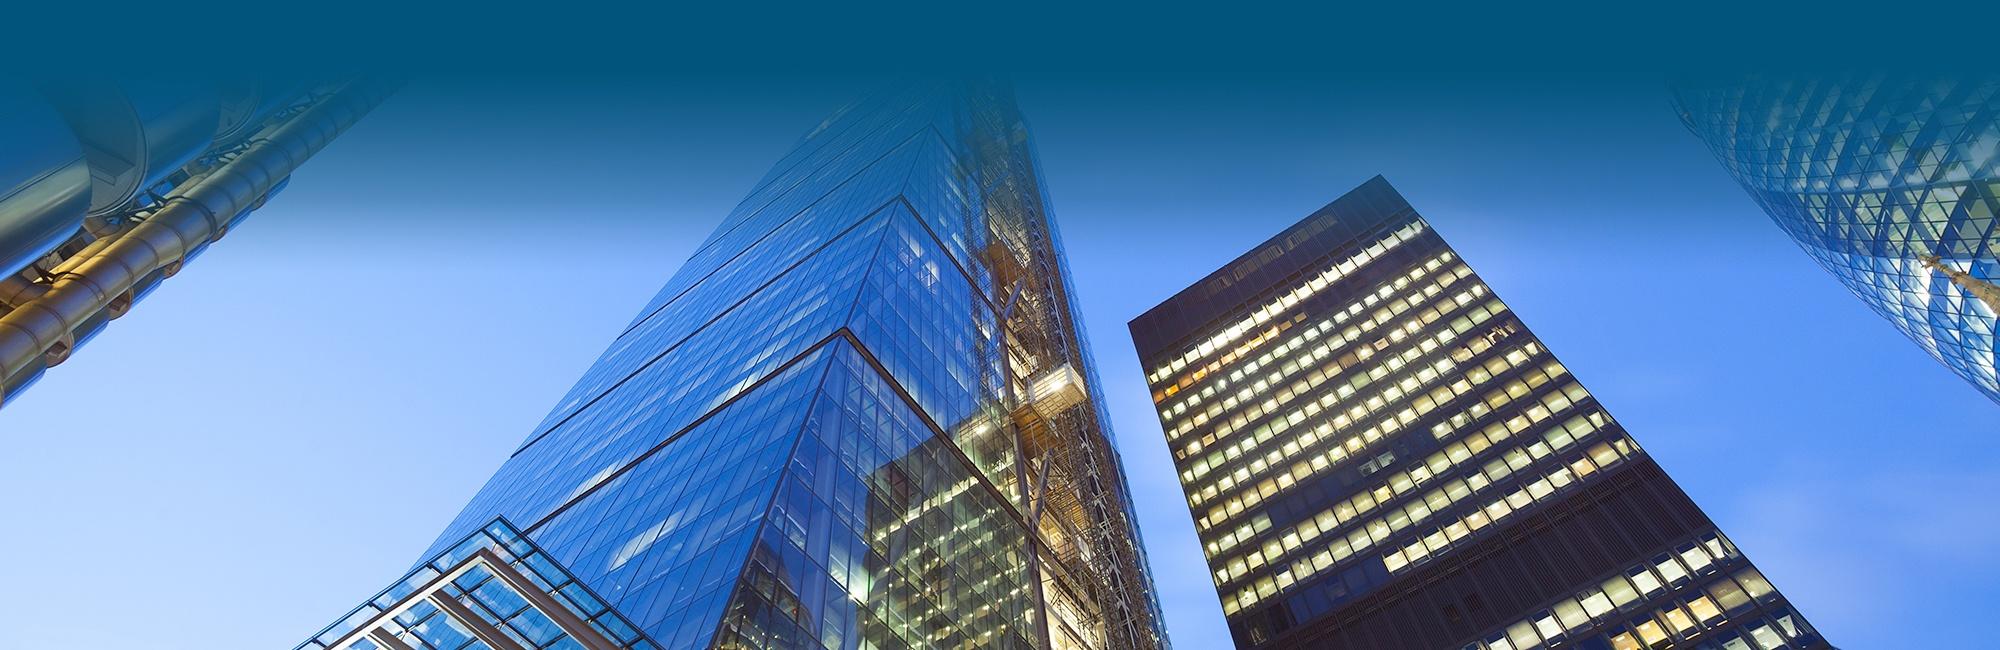 Advance Global Capital - Putting Capital to Work